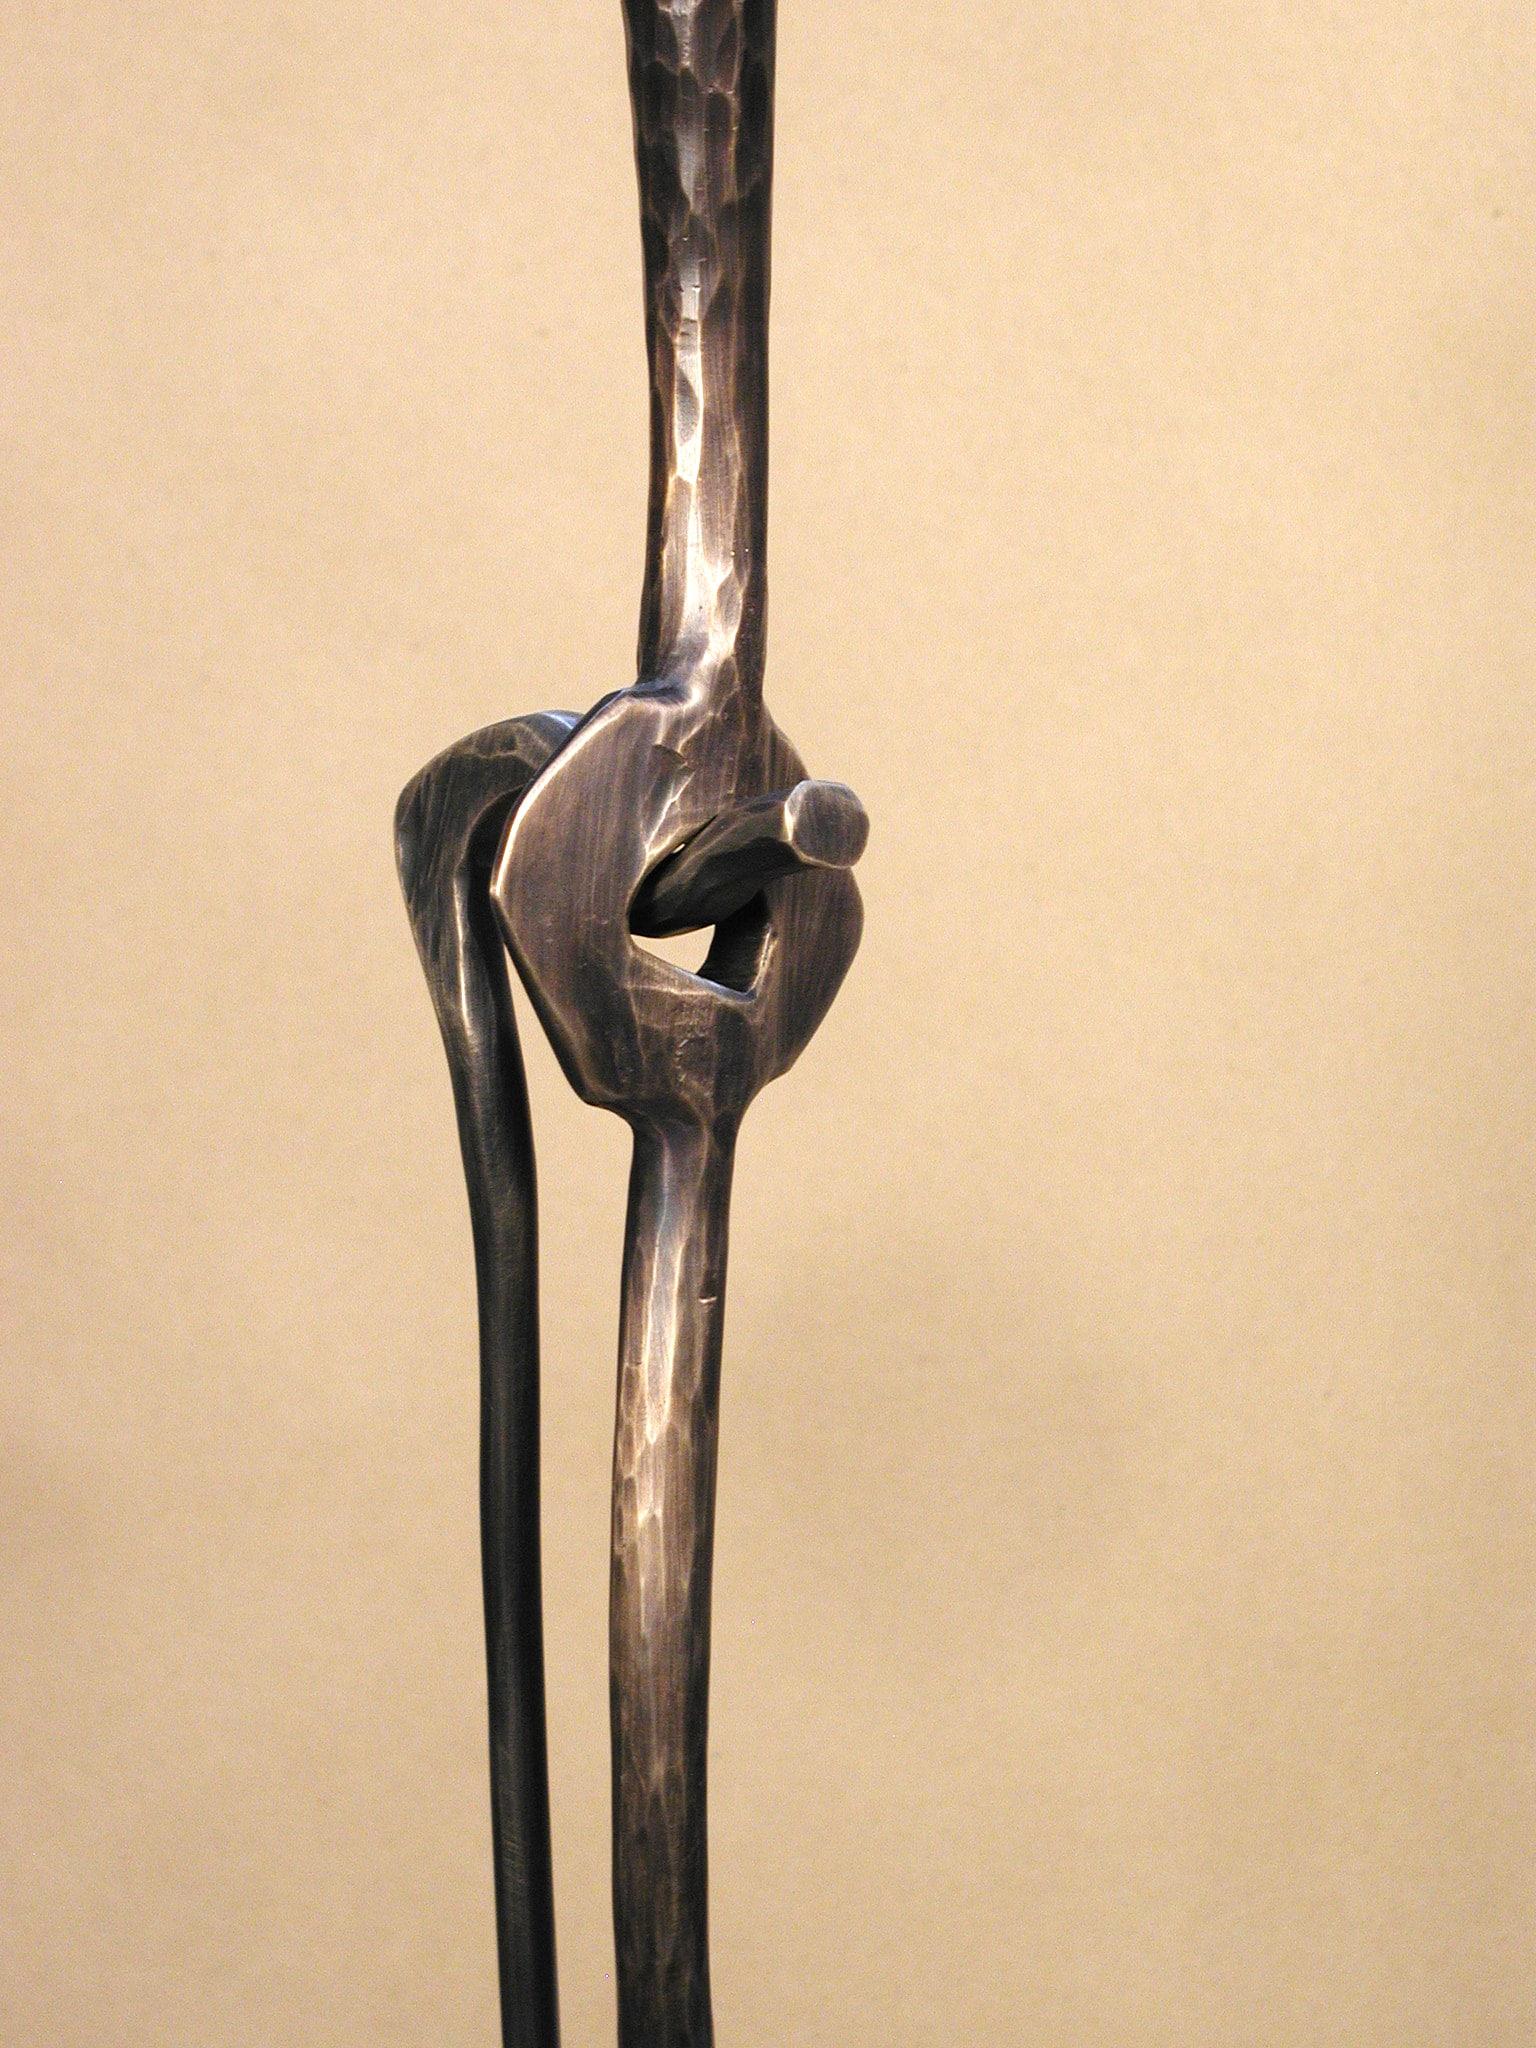 Blacksmith, Forged, Custom, Design, Daniel Hopper Design, Bronze, Fireplace, Tools, Detail